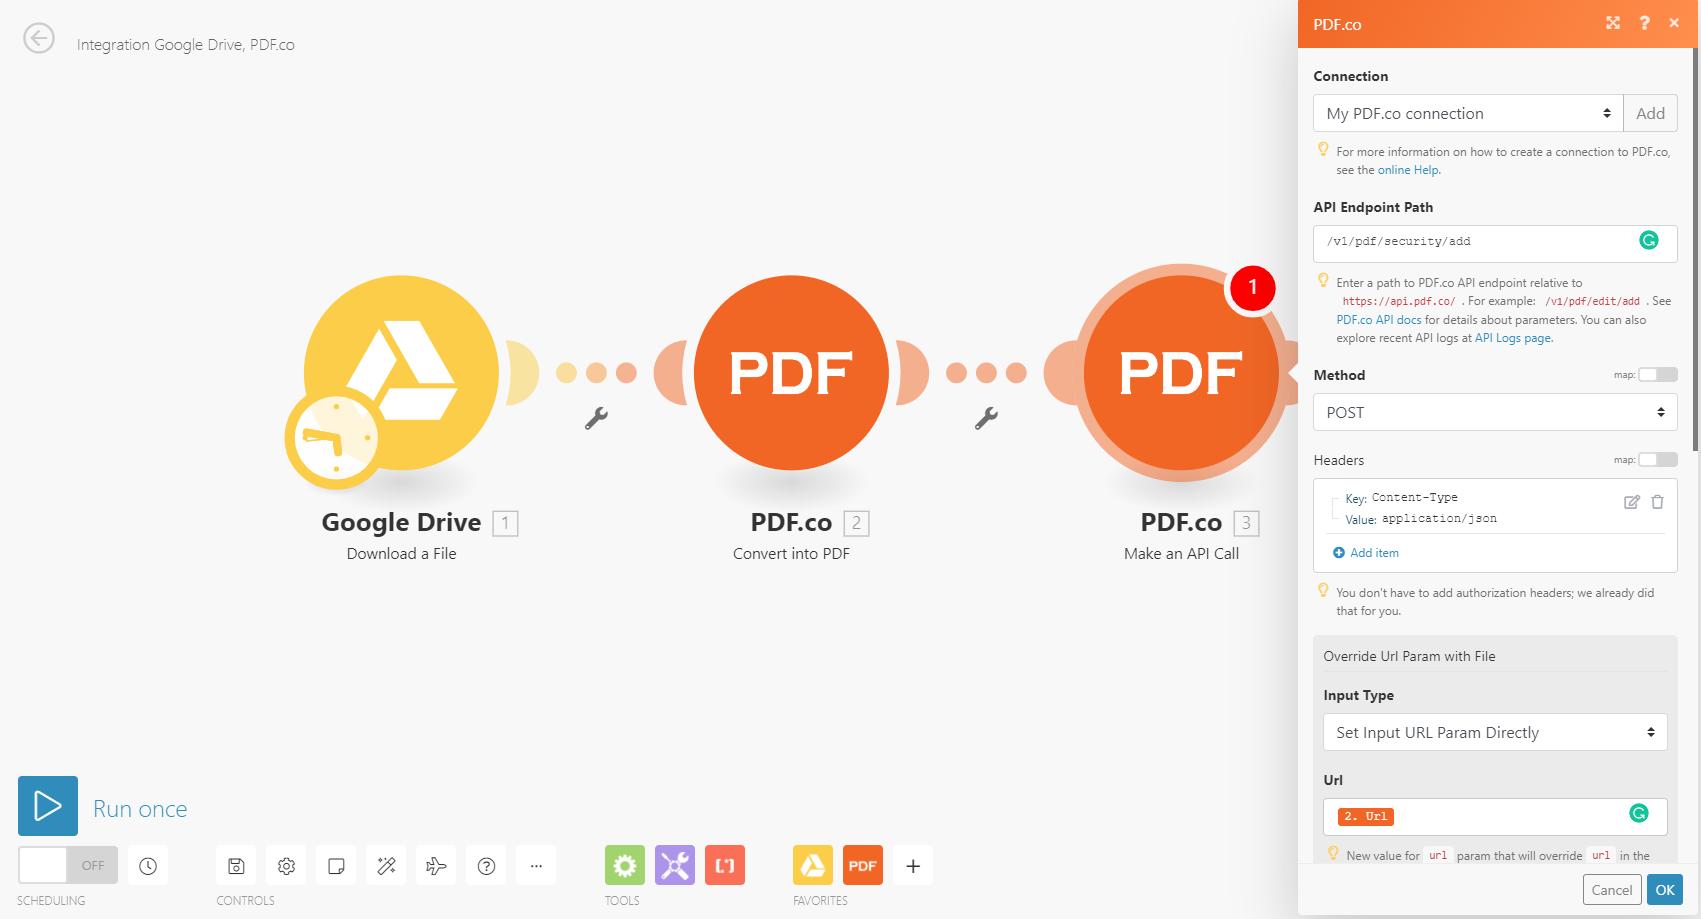 Setup the 2nd PDF.co module